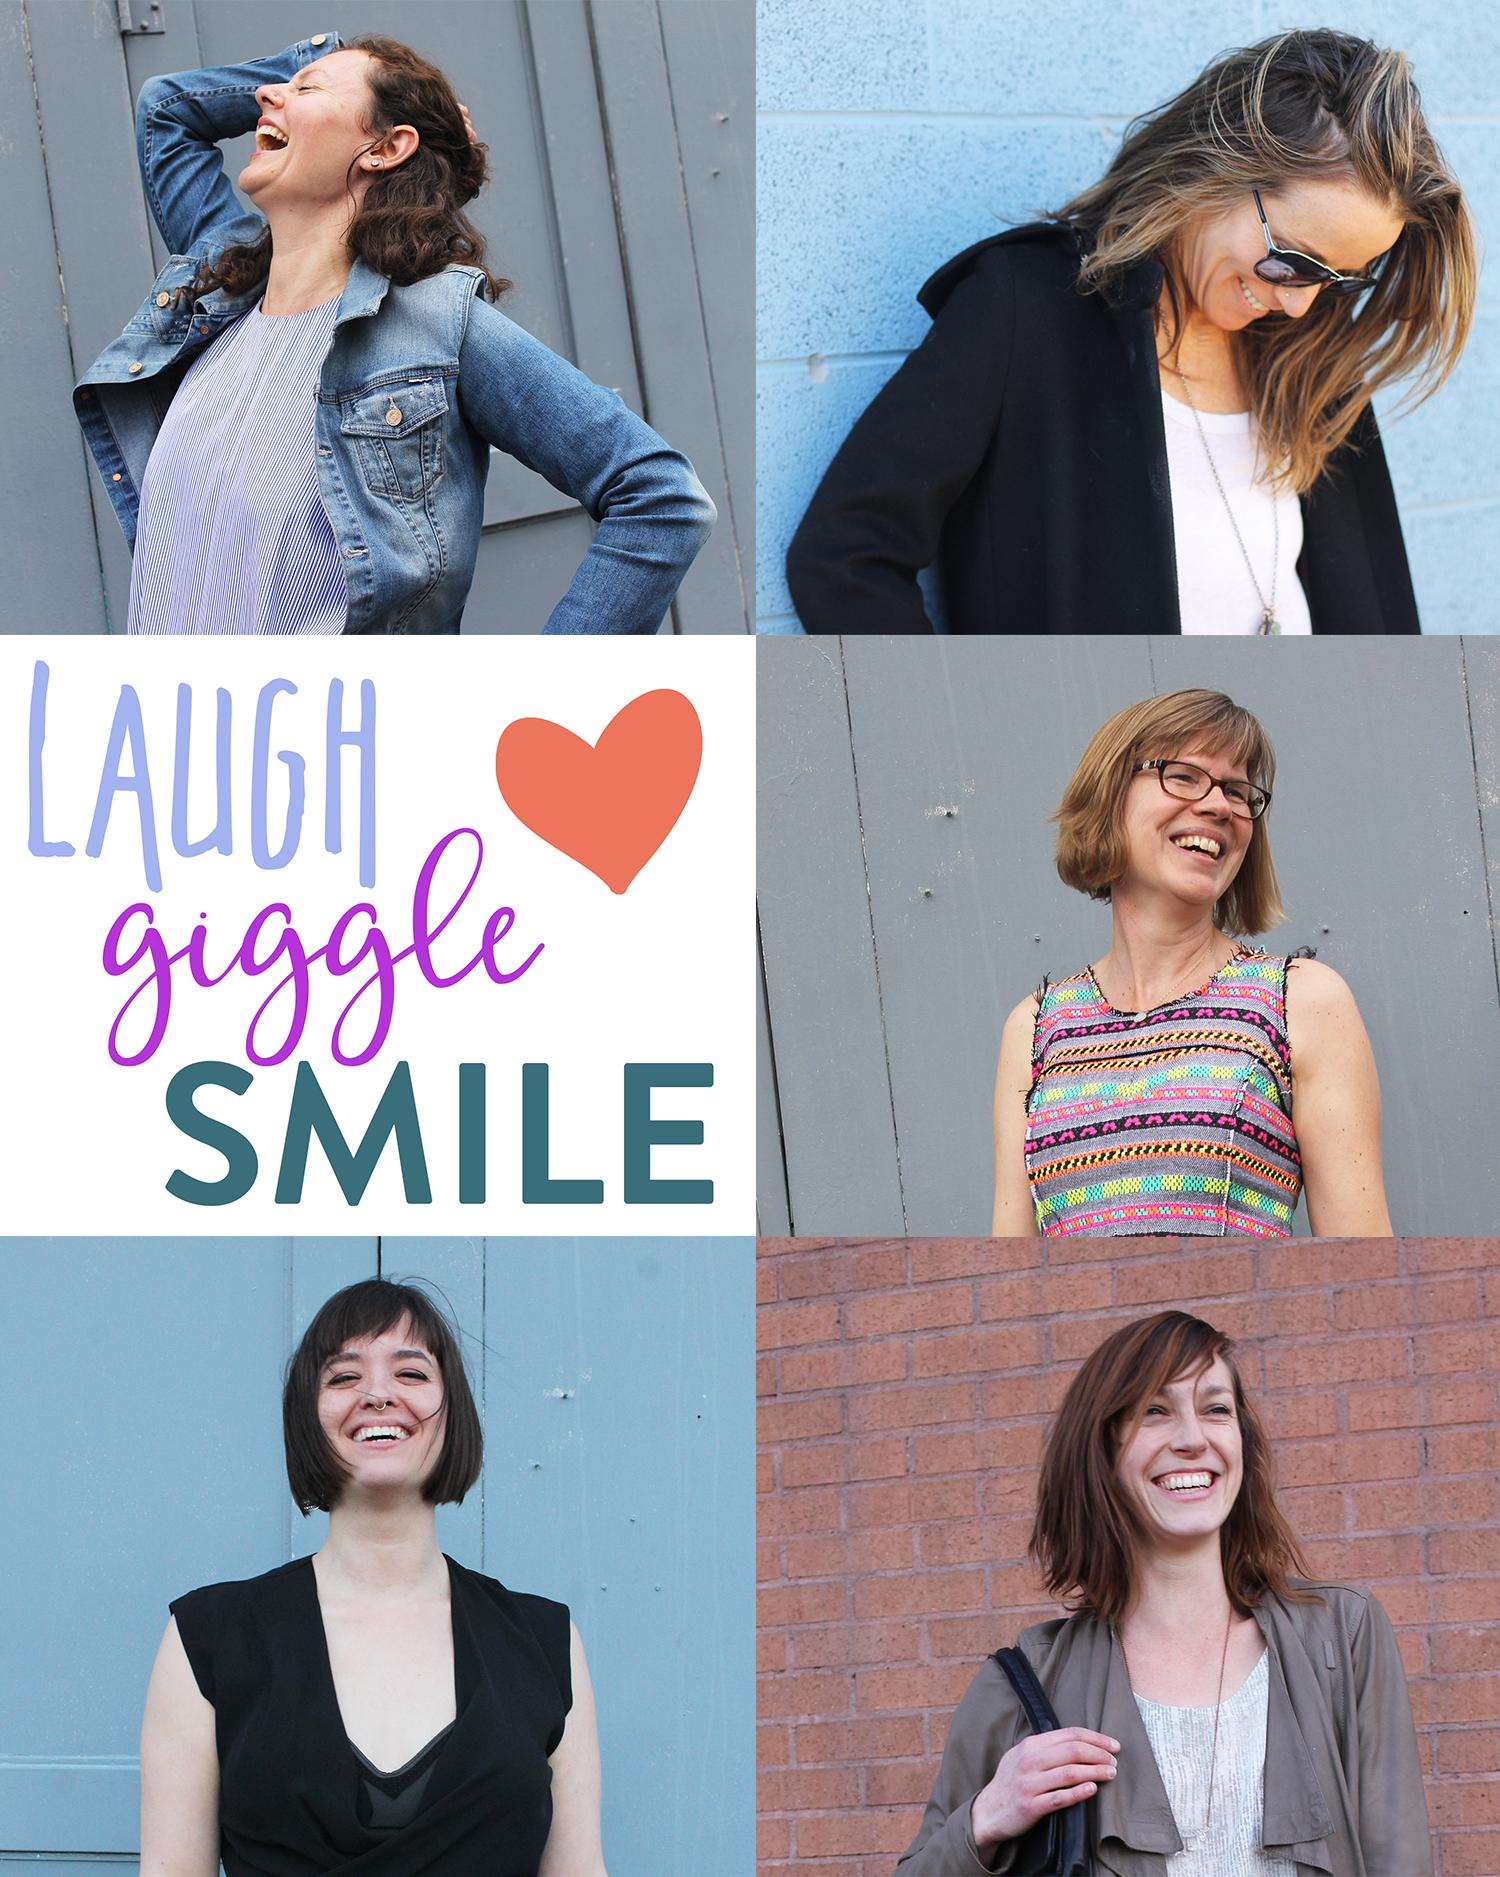 laugh-ct.jpg